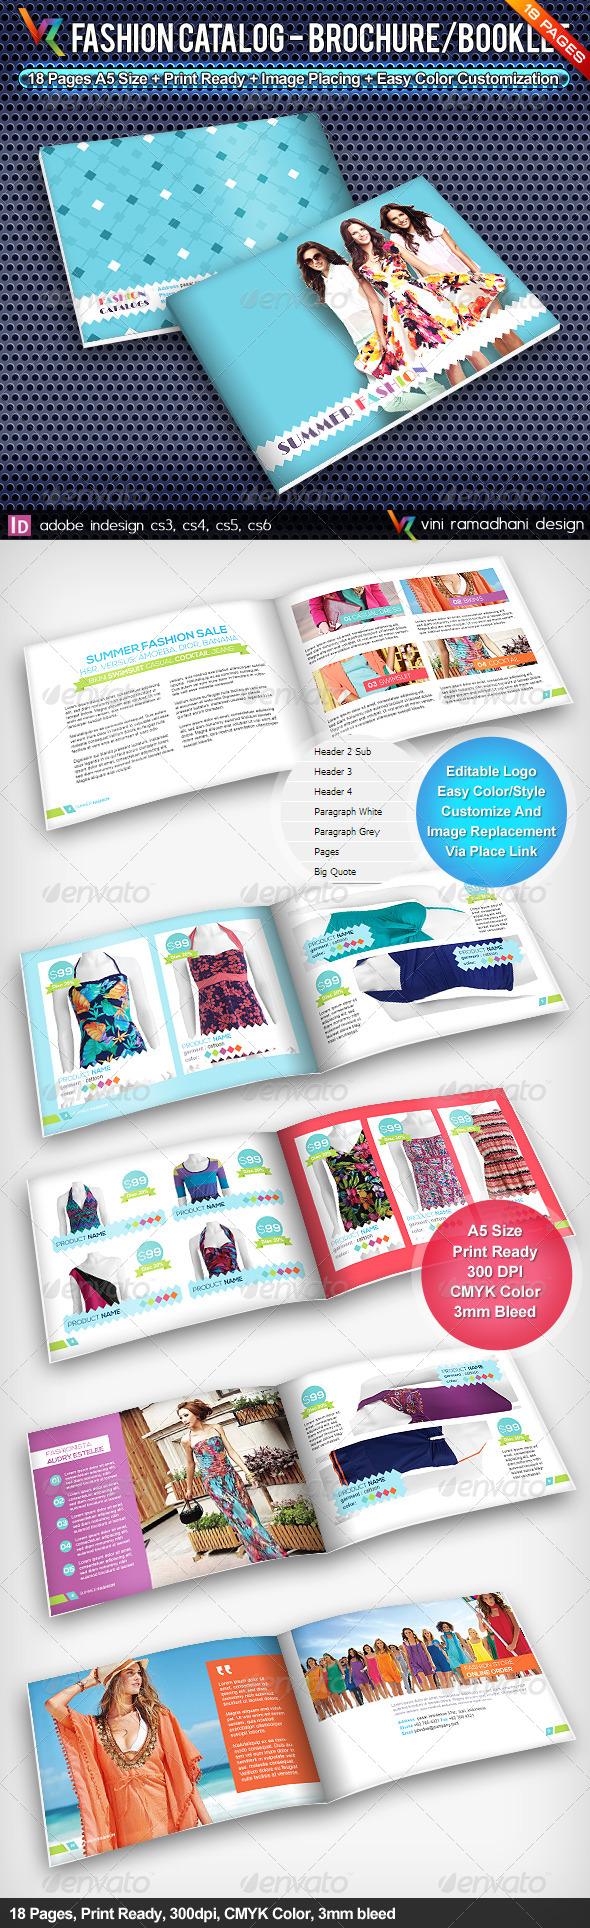 GraphicRiver Summer Fashion Catalog Brochure 4628888